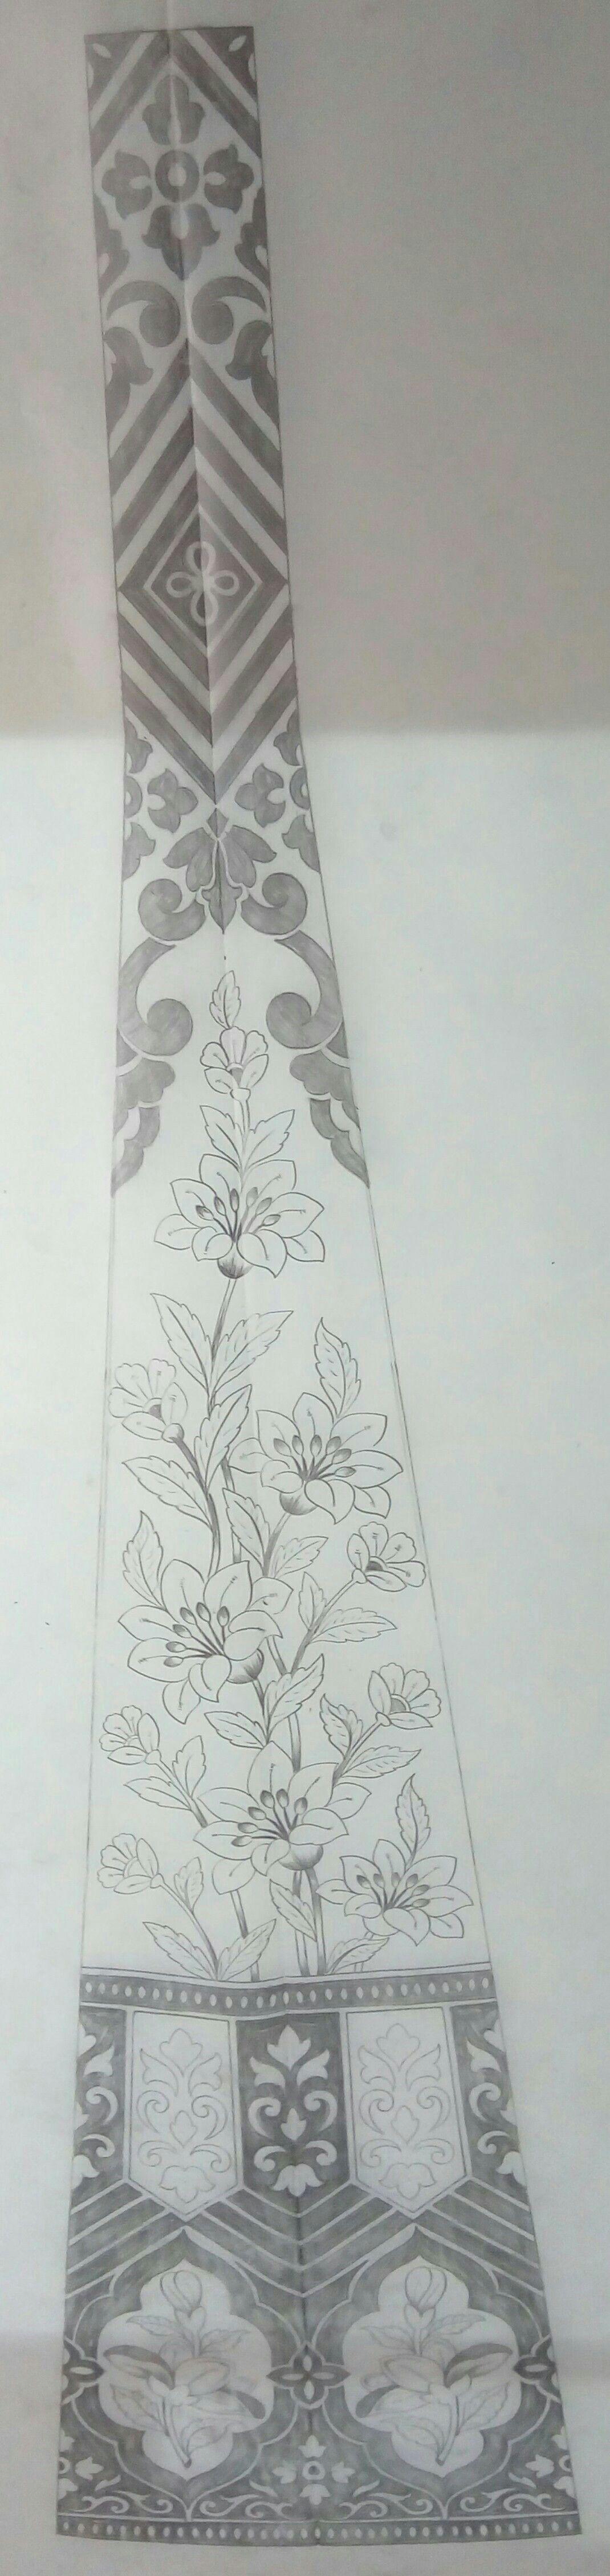 Pin de fabiola en bordados | Pinterest | Bordado, Dibujos para ...